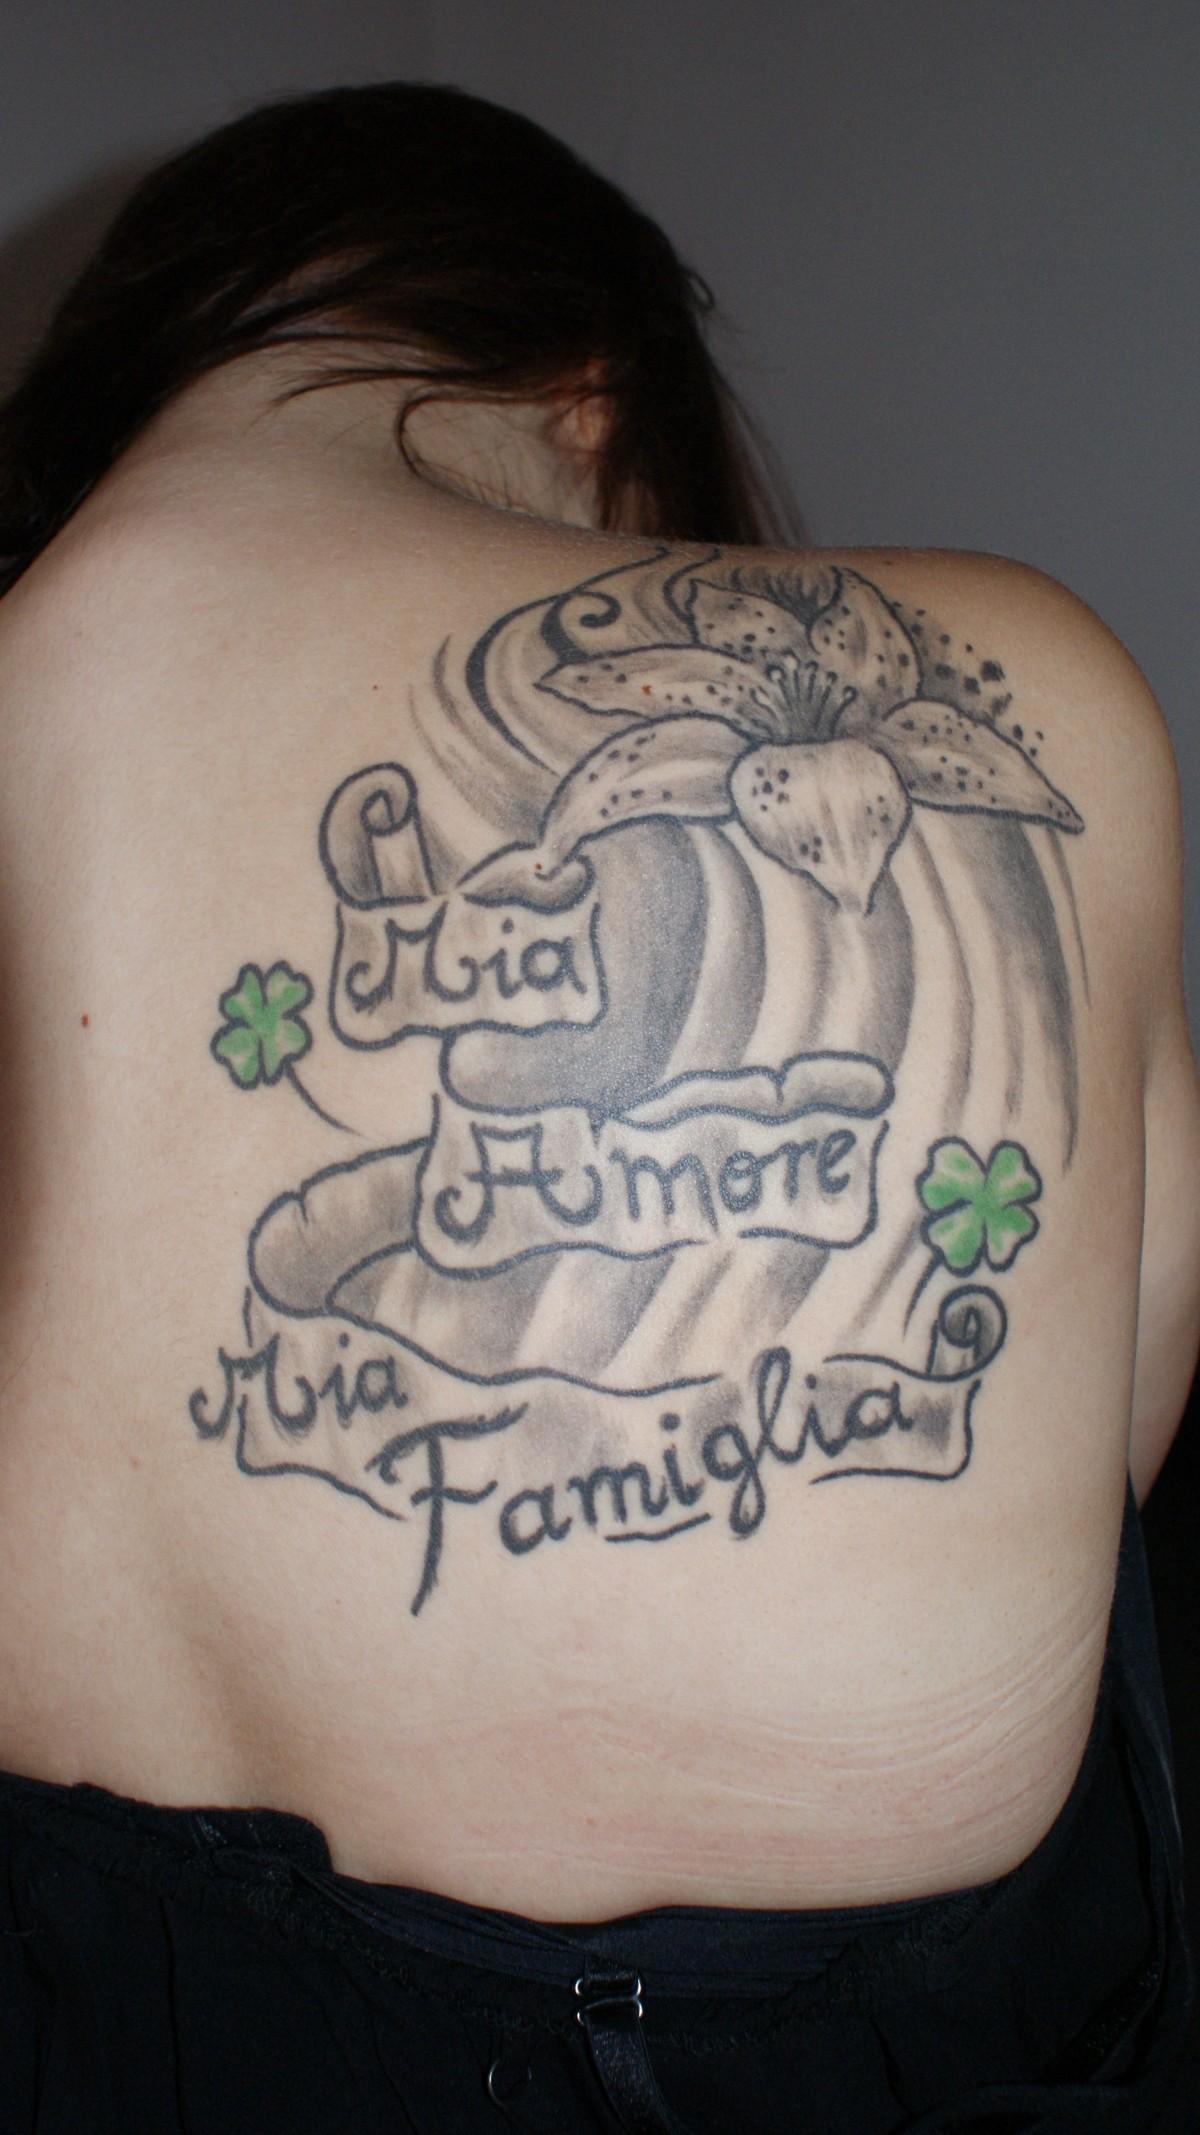 images gratuites femme tatouage bras poitrine corps humain esquisser dessin bouge toi. Black Bedroom Furniture Sets. Home Design Ideas